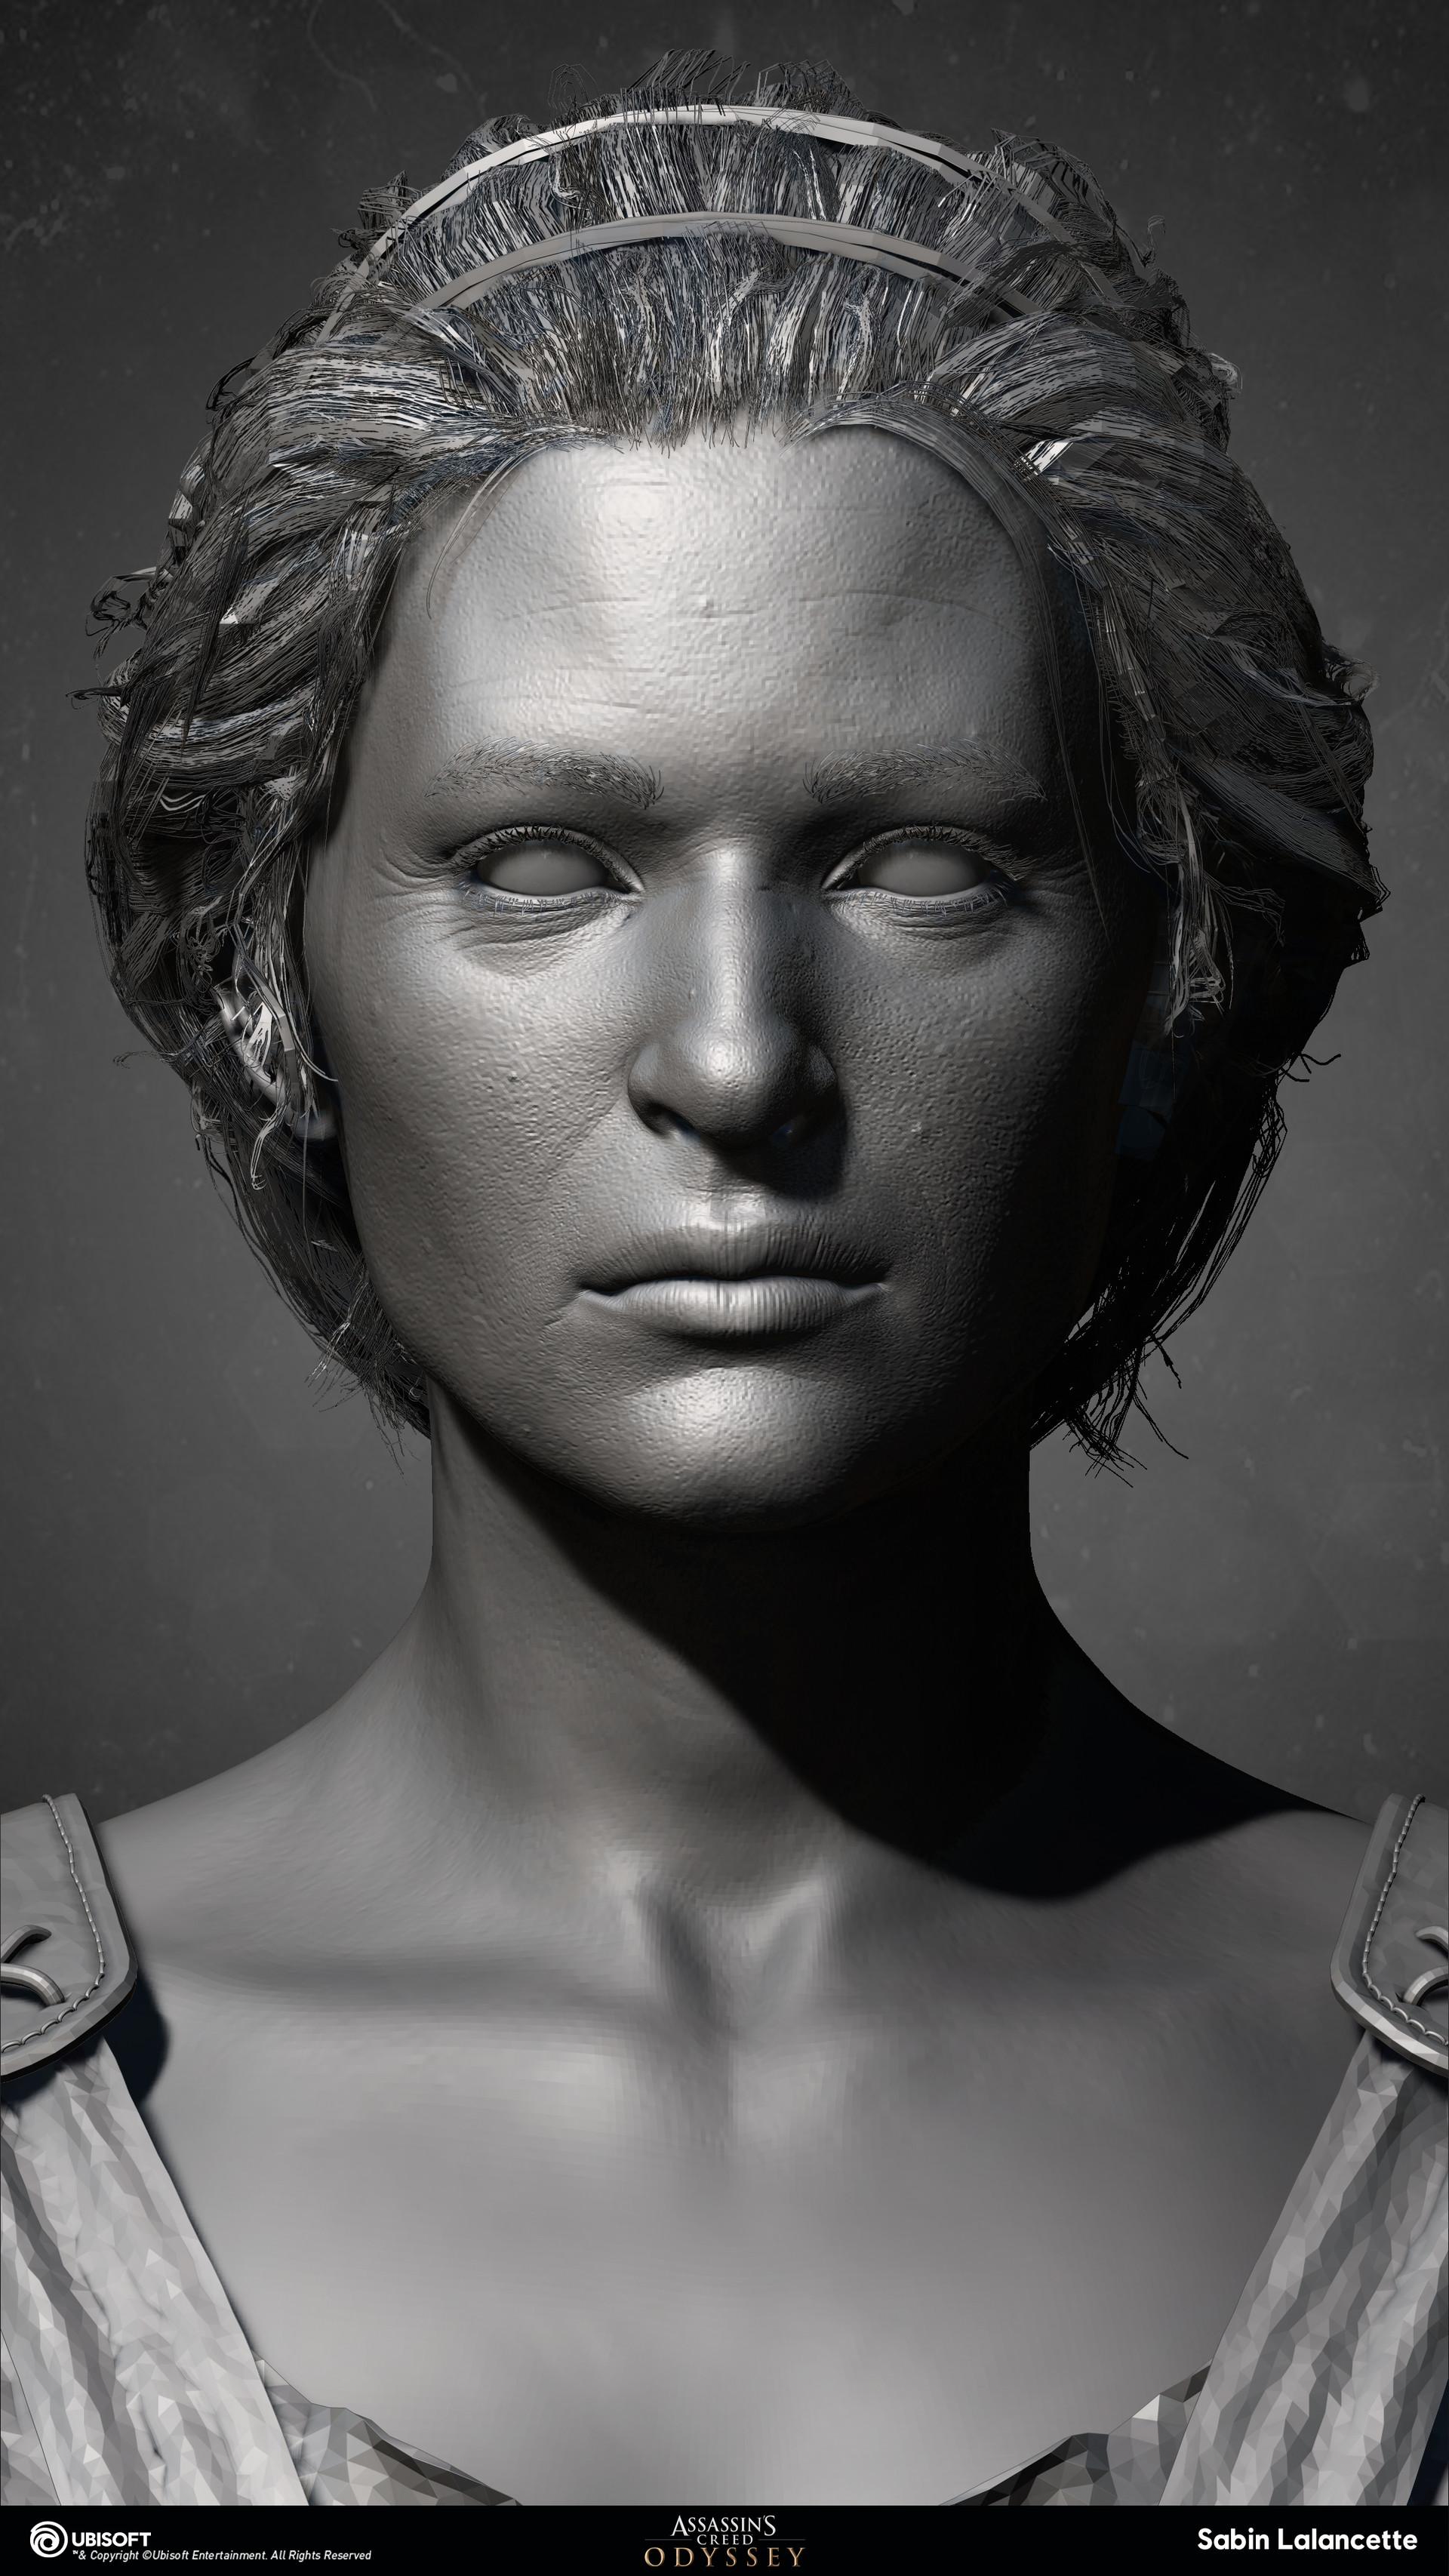 sabin-lalancette-artblast-fullsizezb-hex-portraitfront-myrinneold-slalancette